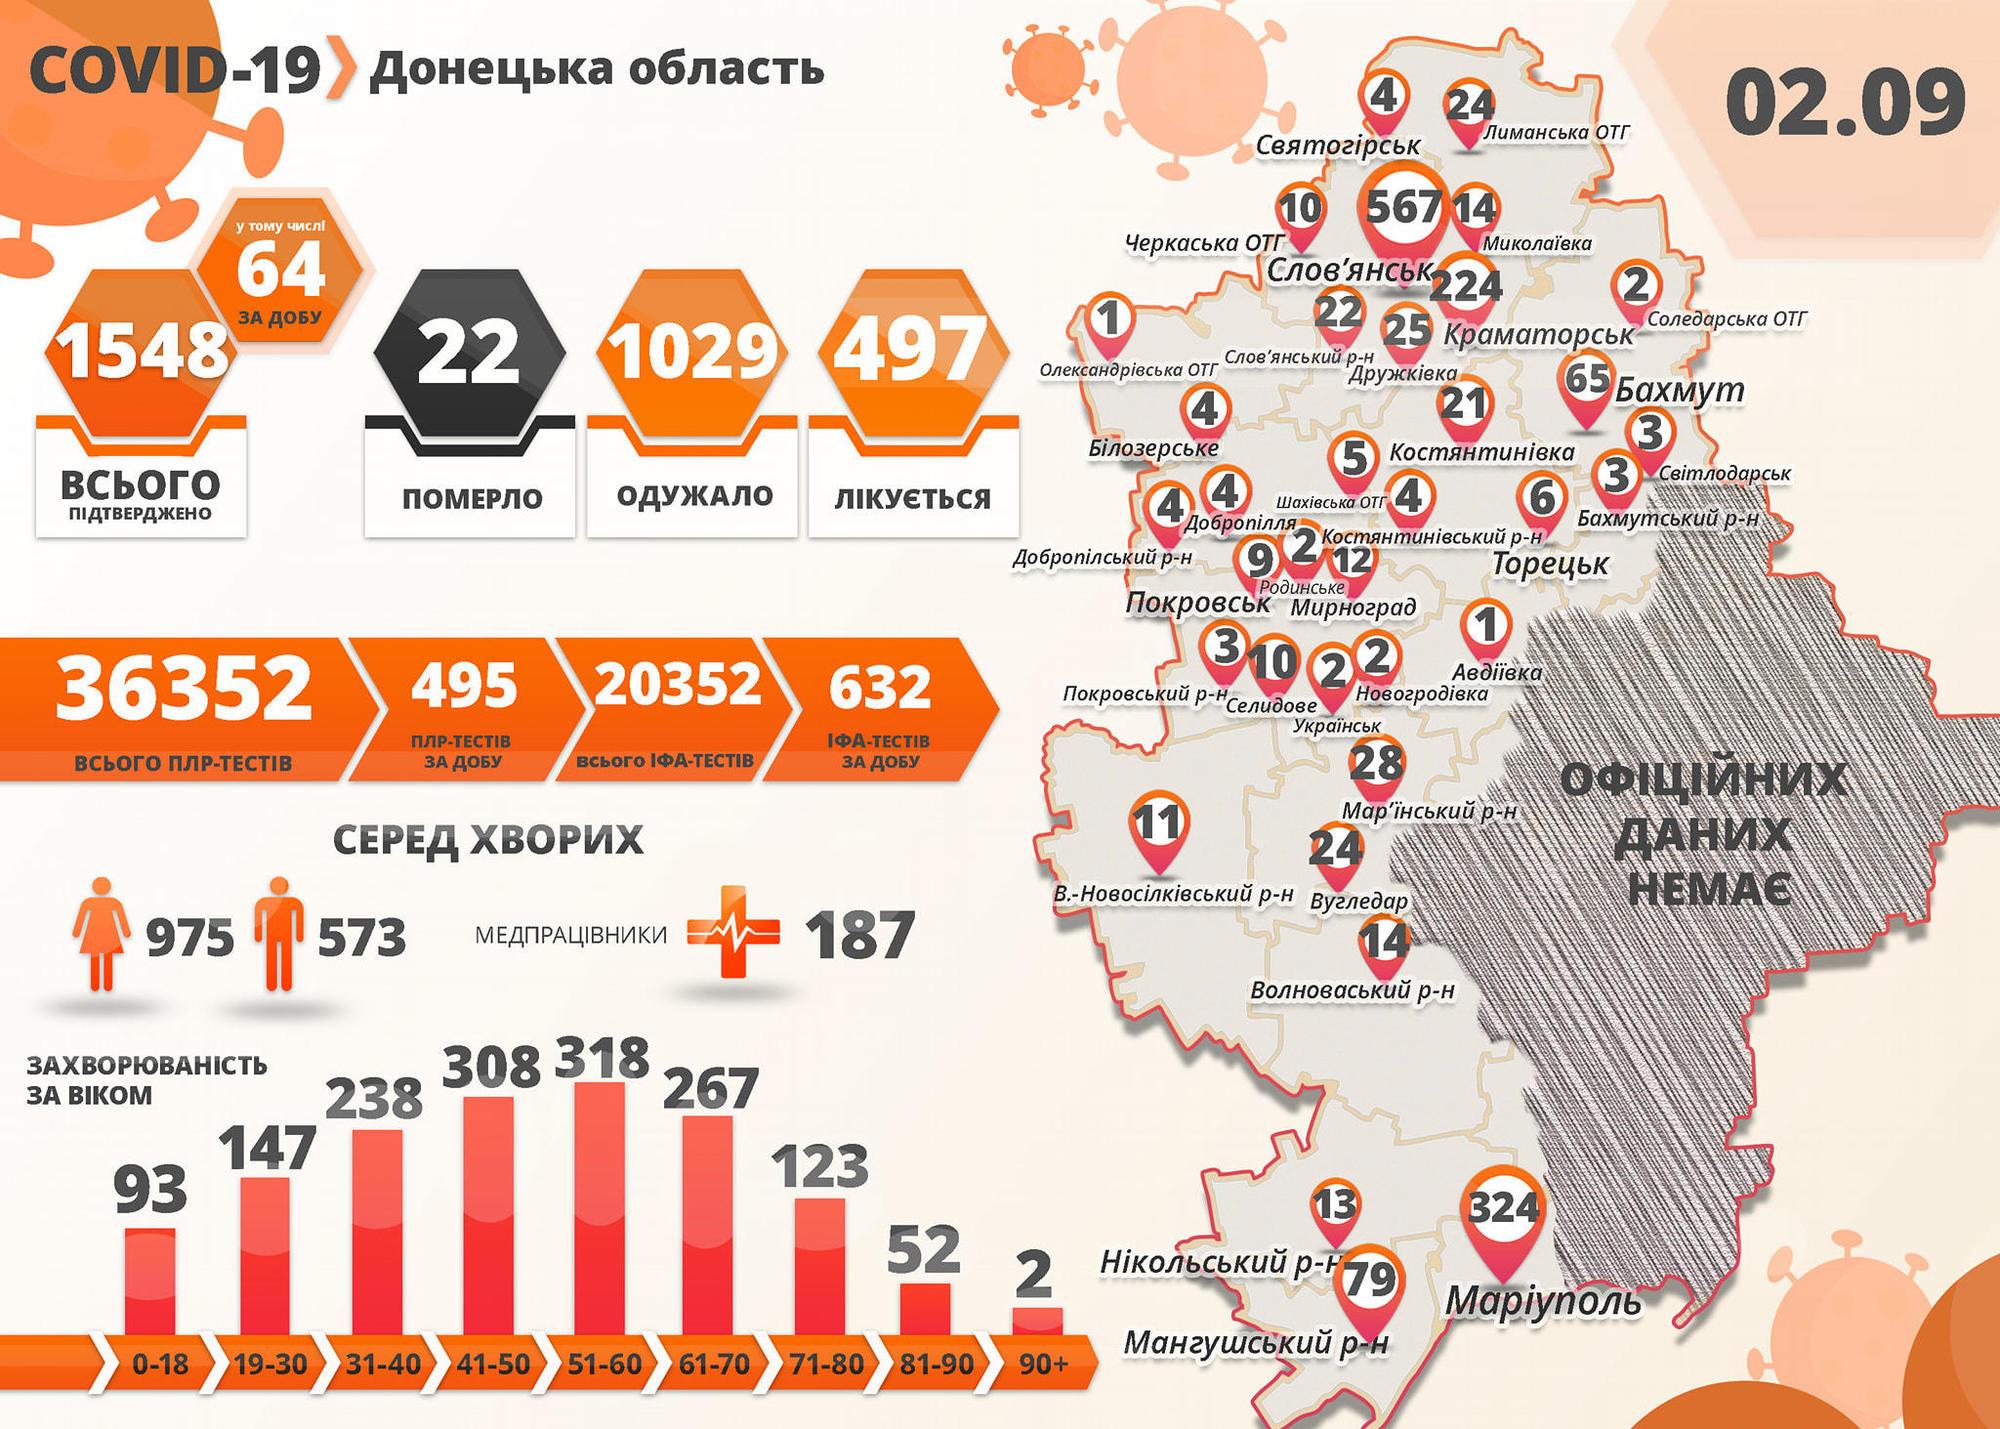 инфографика ДонОГА коронавирус статистика на 3 сентября